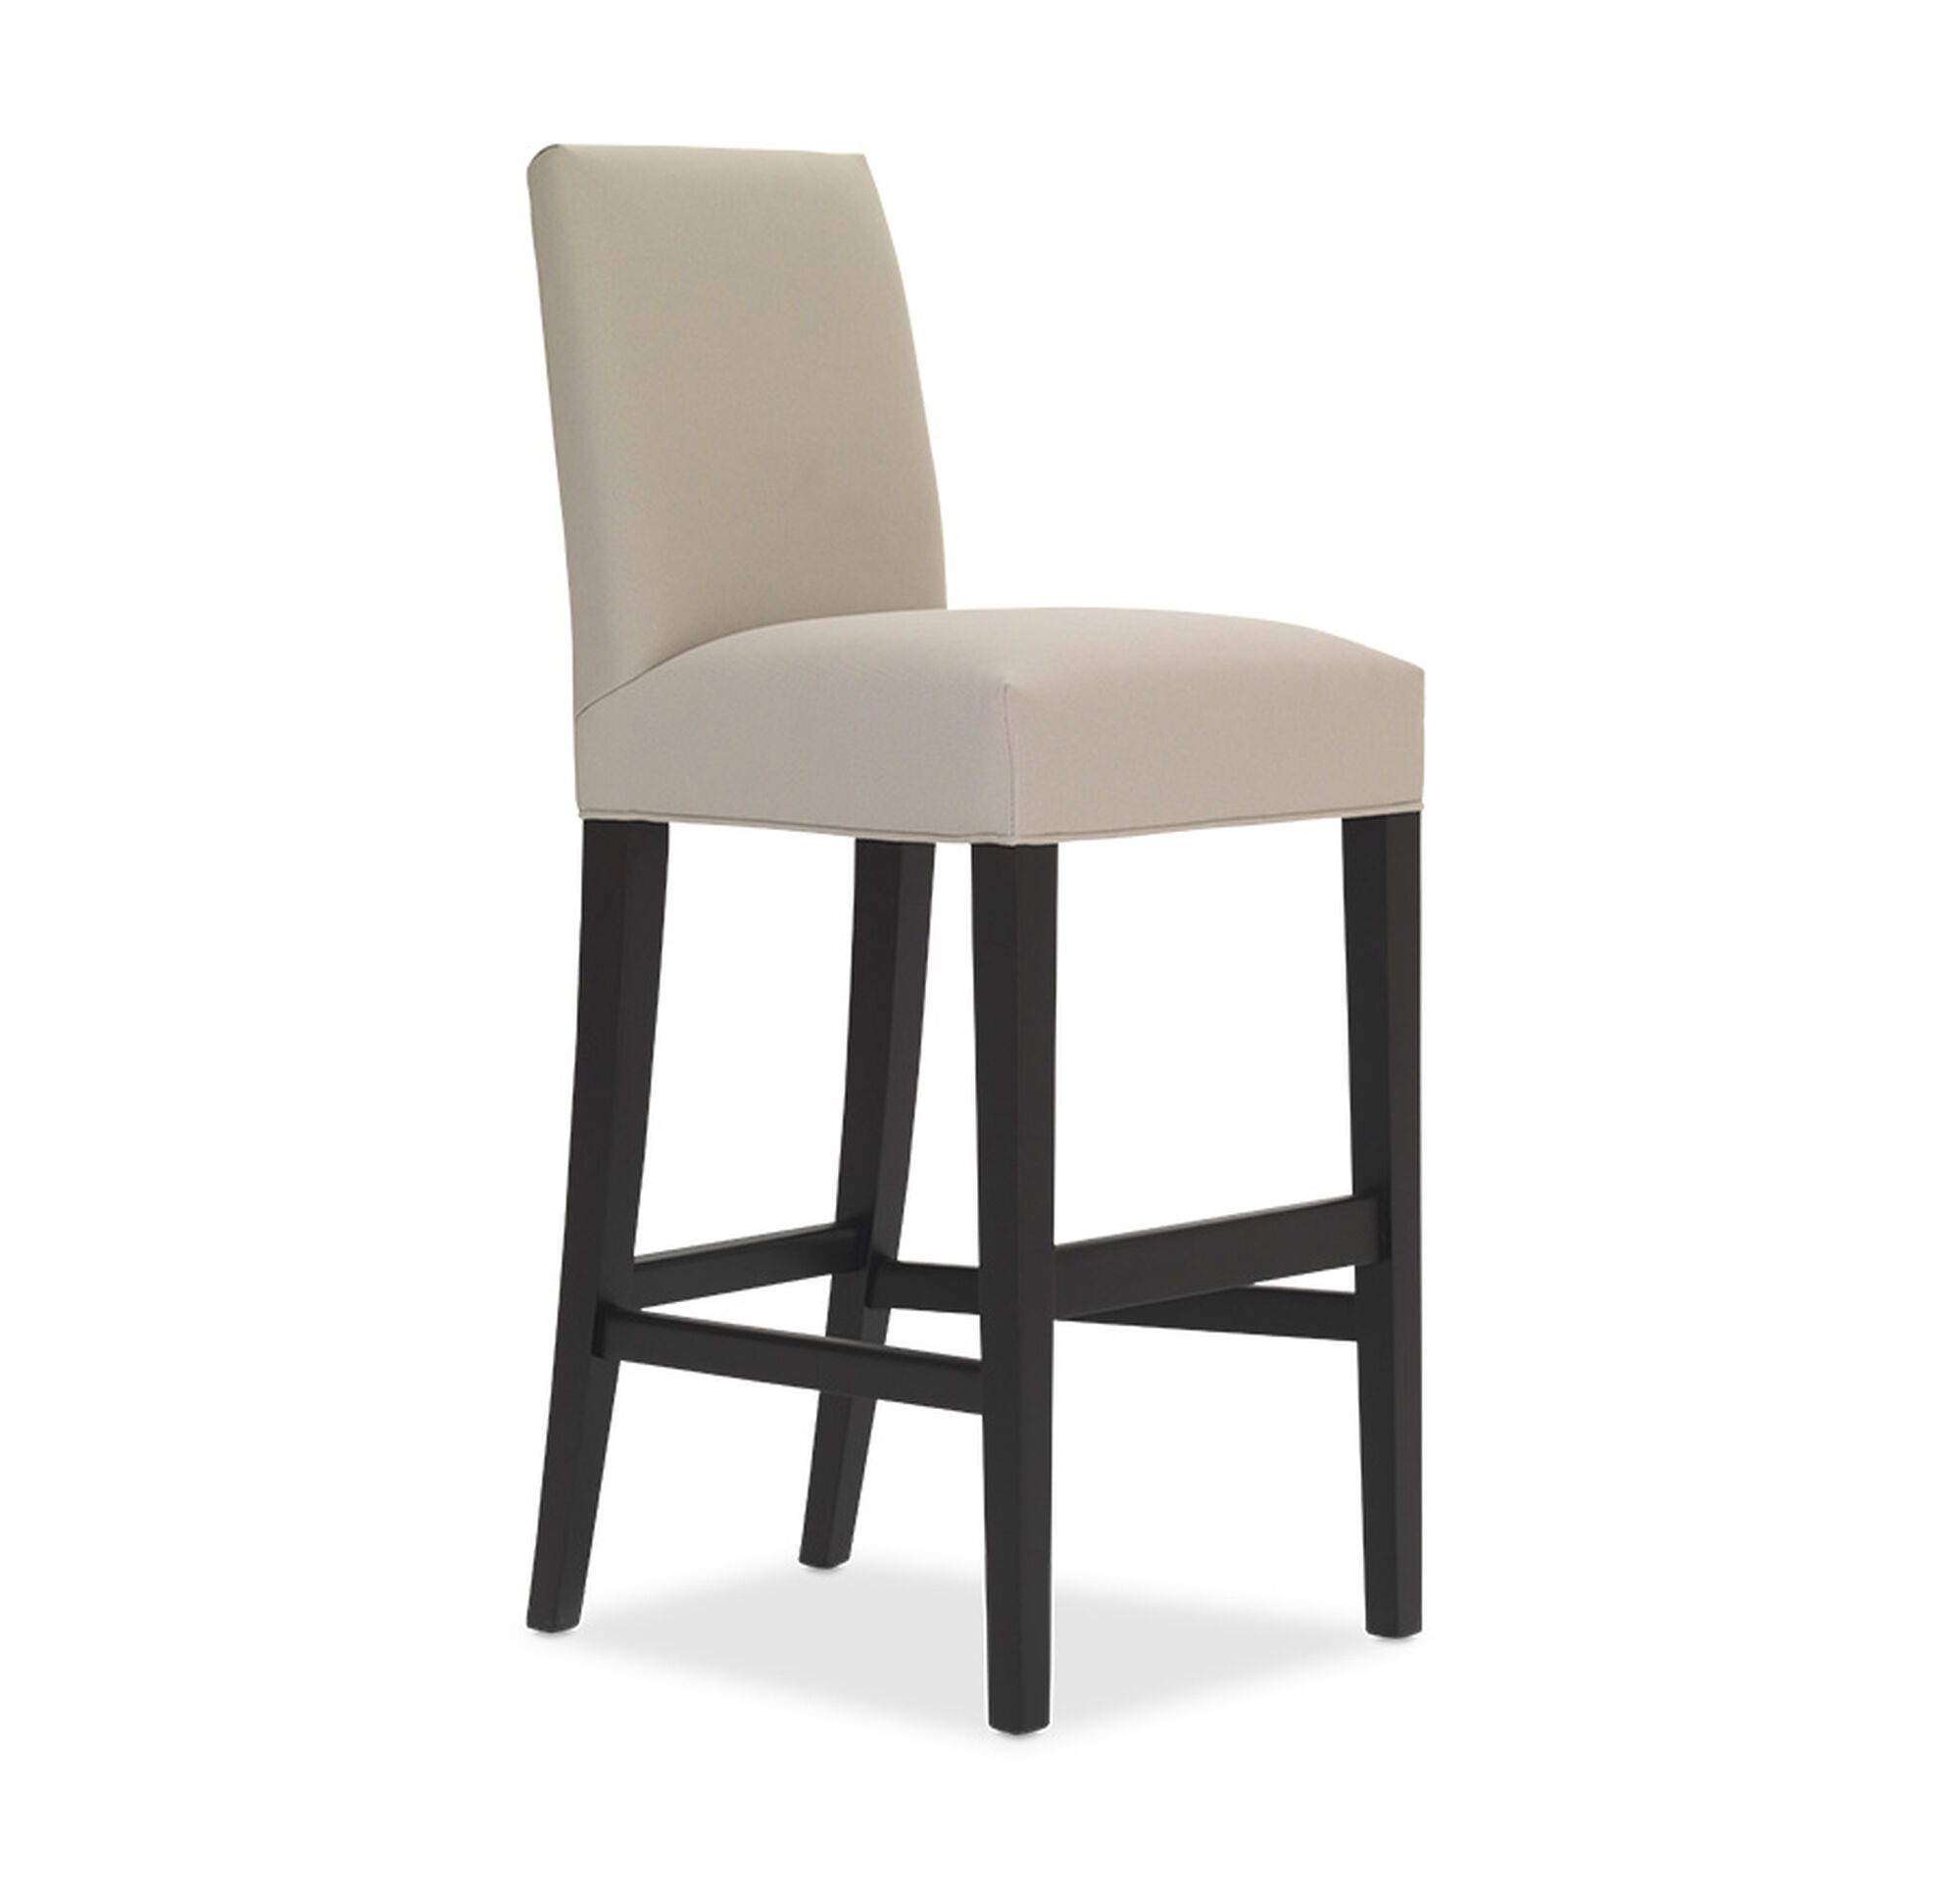 beige bar stools. ANTHONY BAR STOOL, , Hi-res Beige Bar Stools T